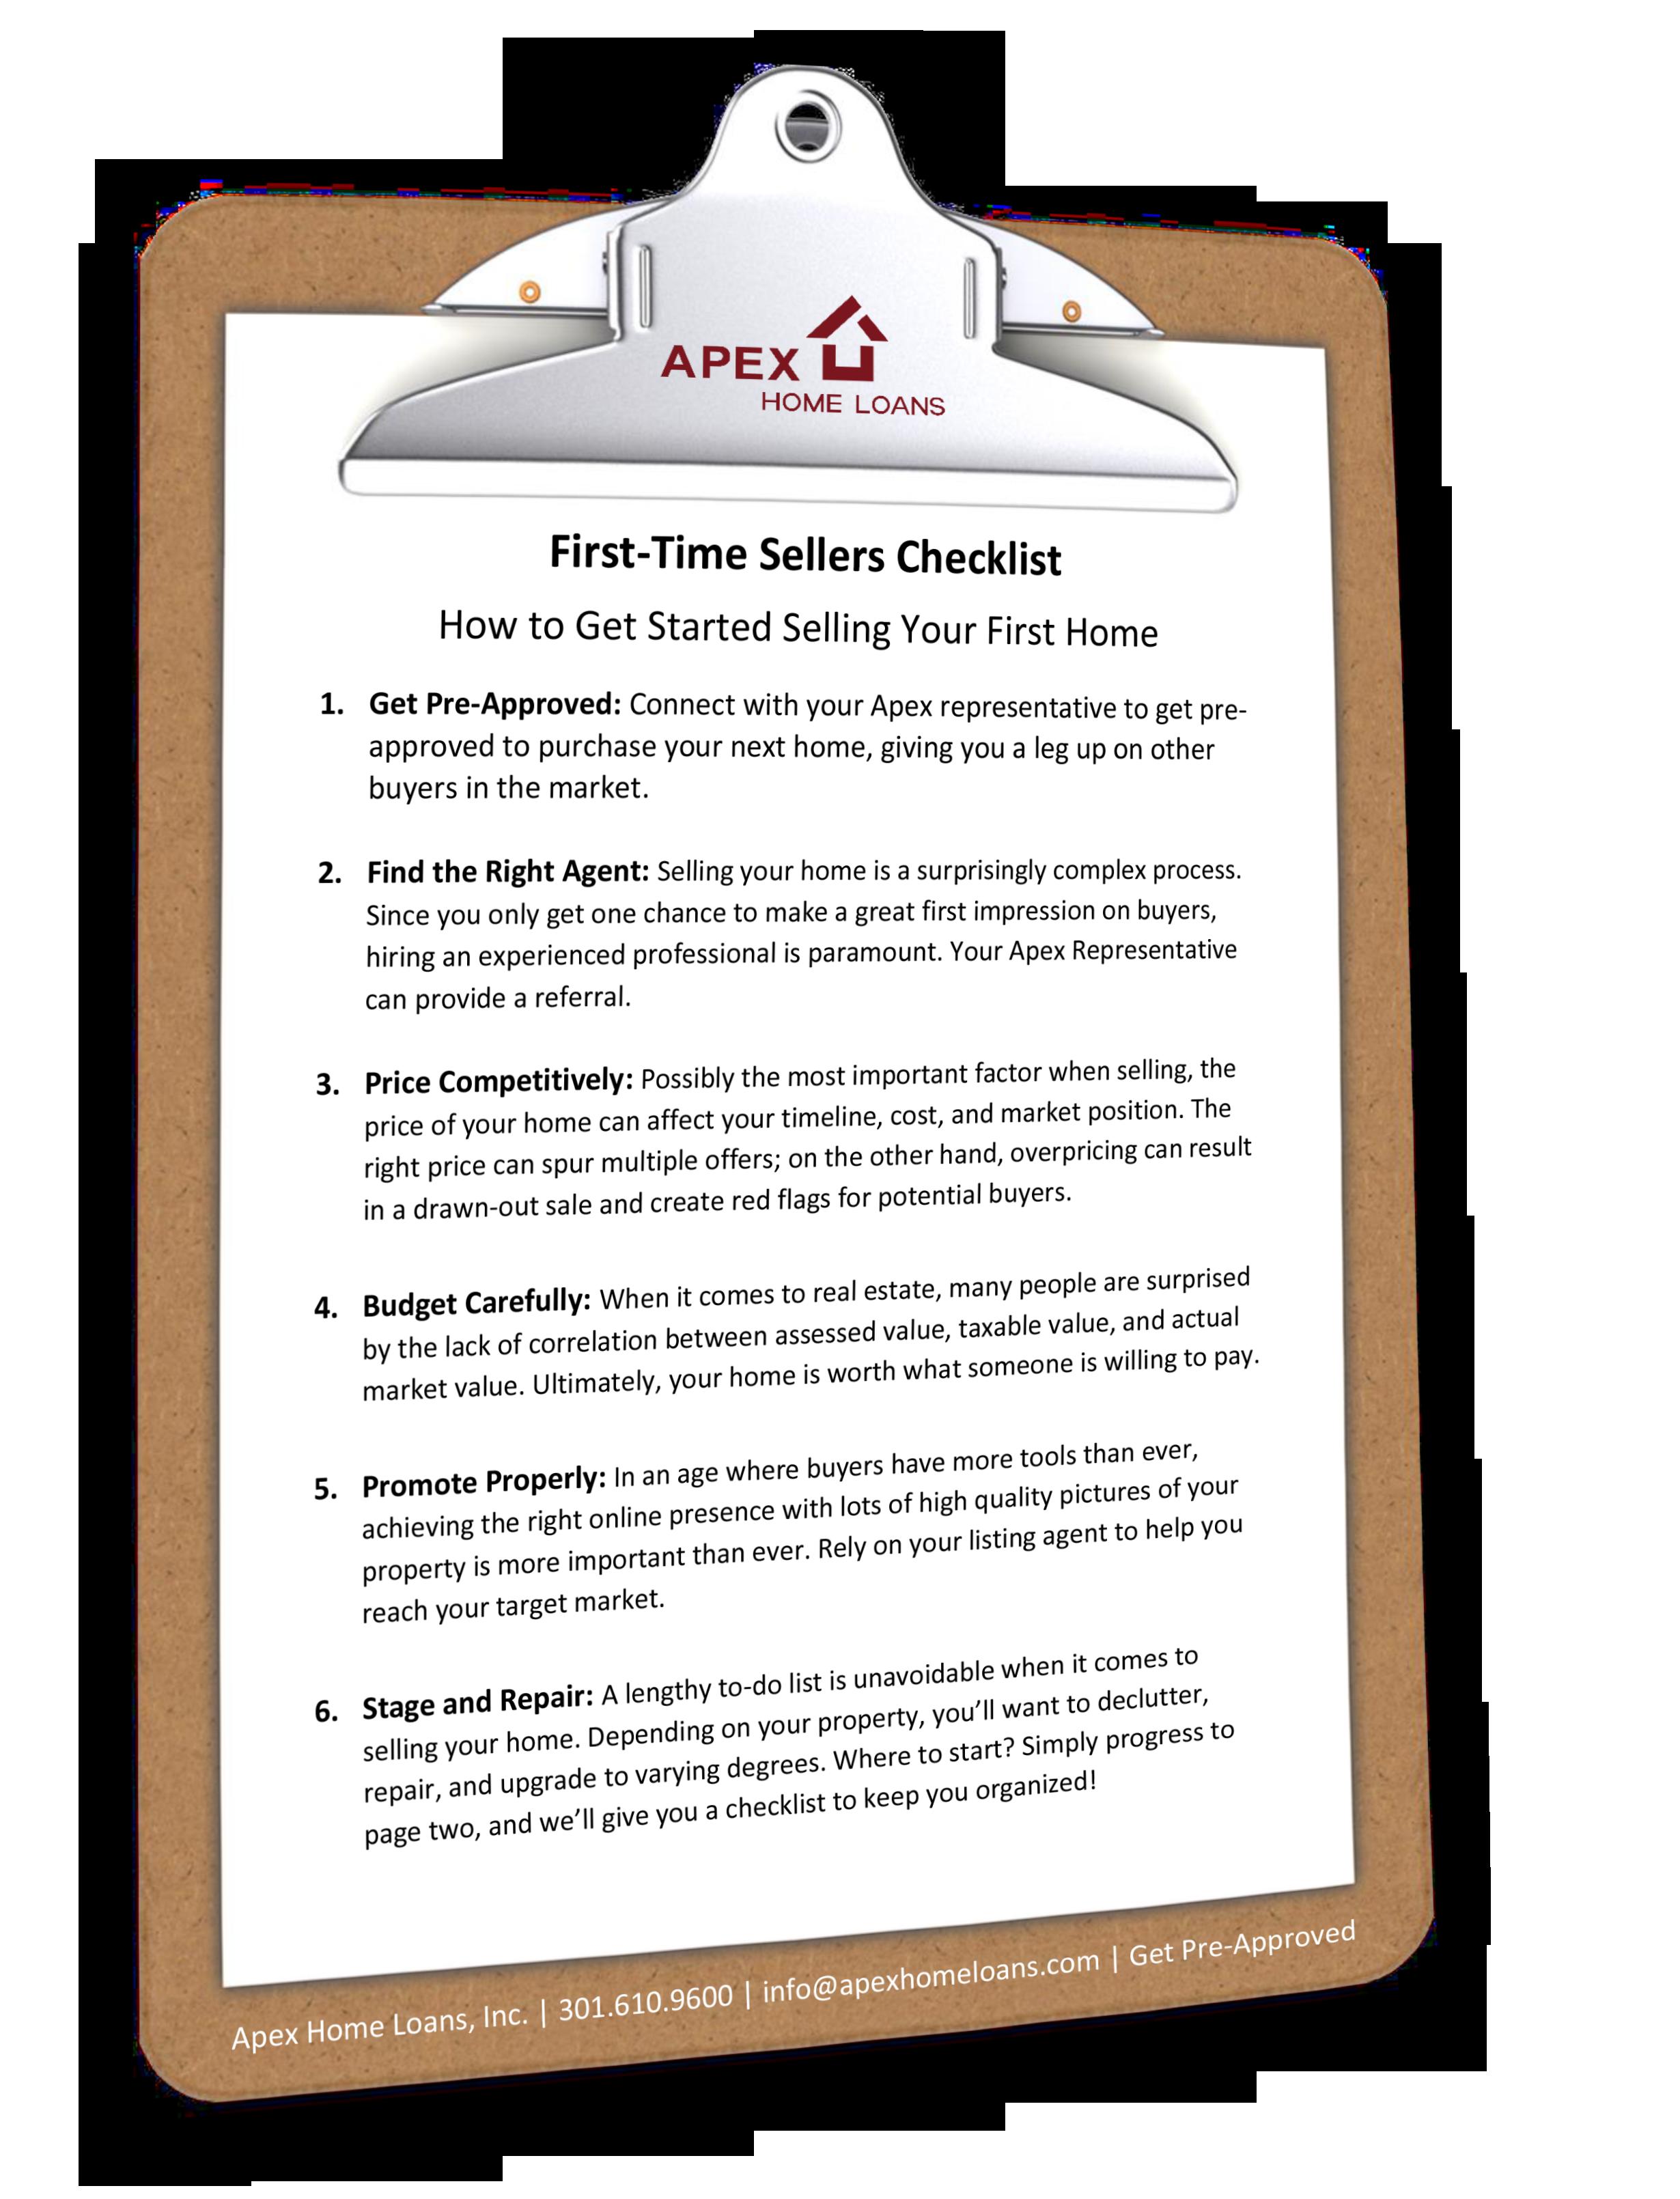 First-Time Seller Checklist